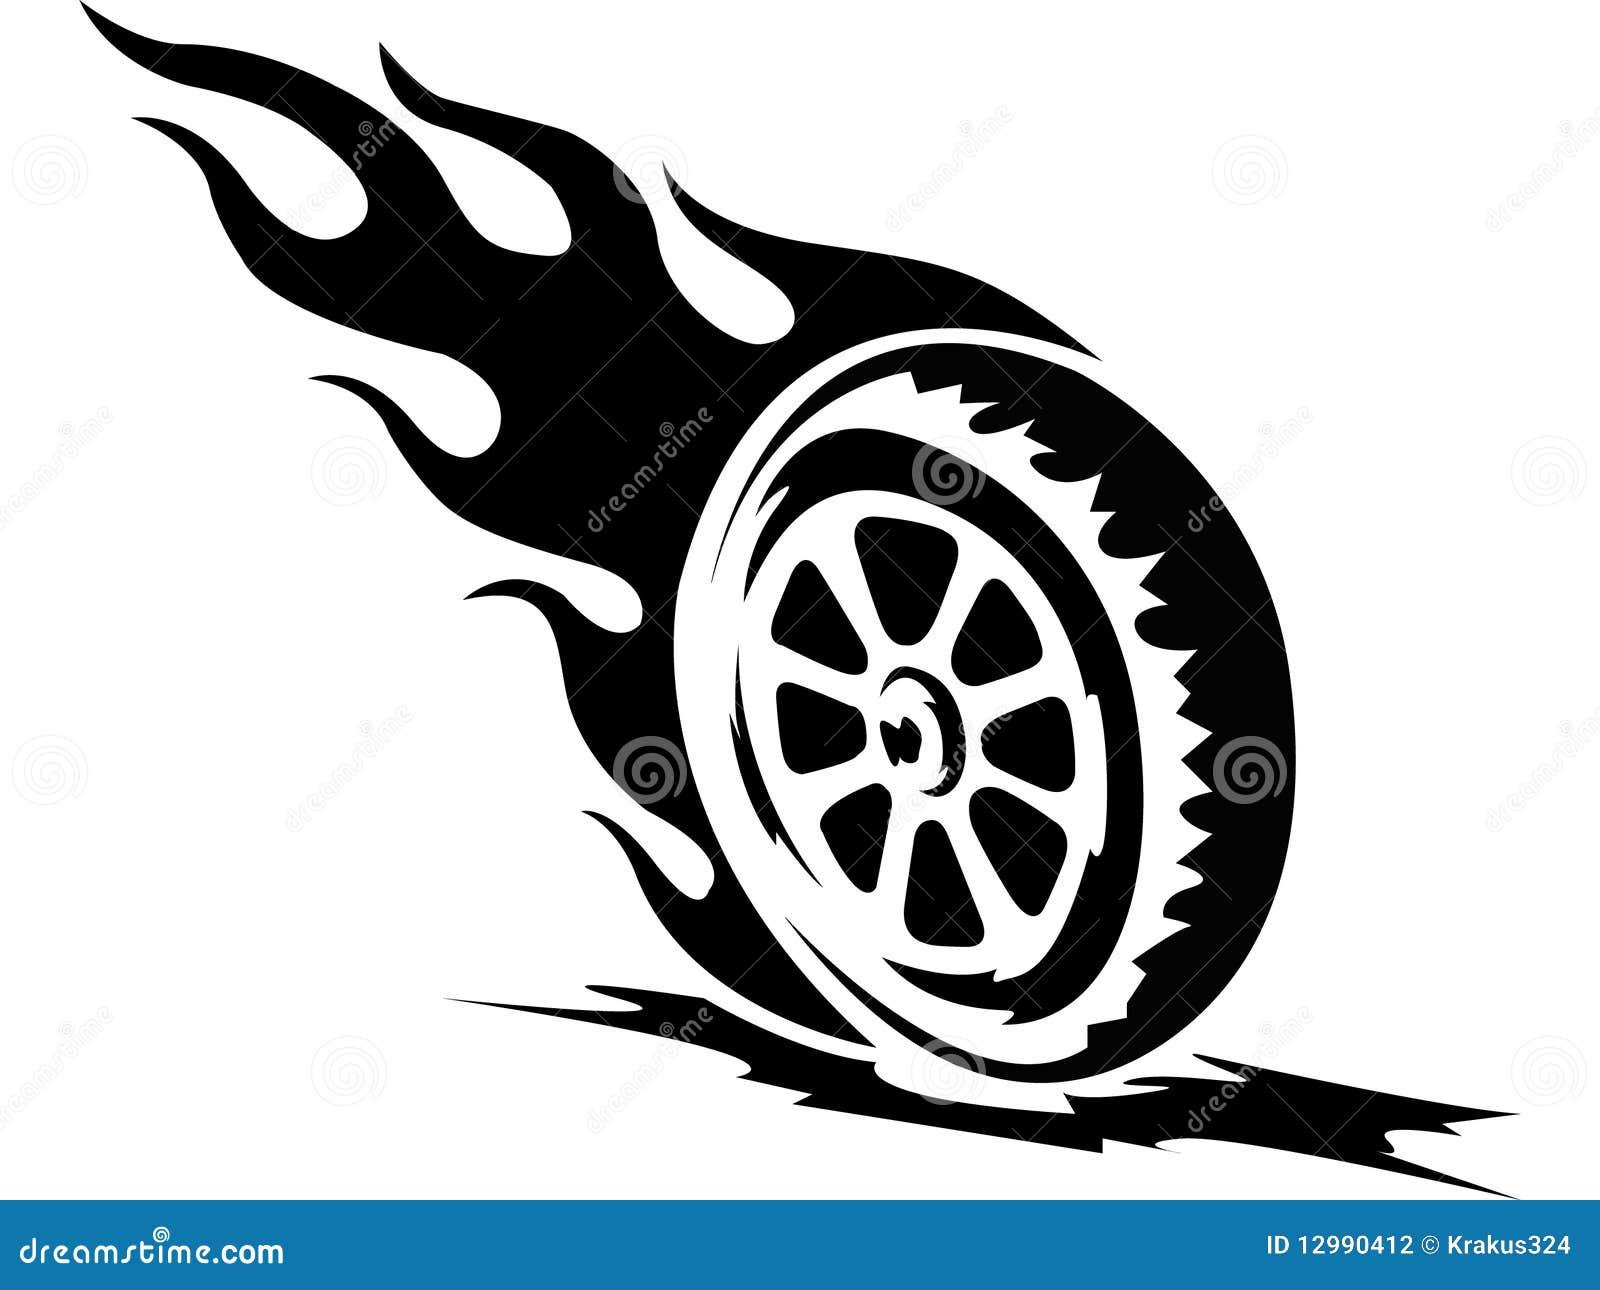 Tattoo Fire Wheel Stock Photography - Image: 12990412